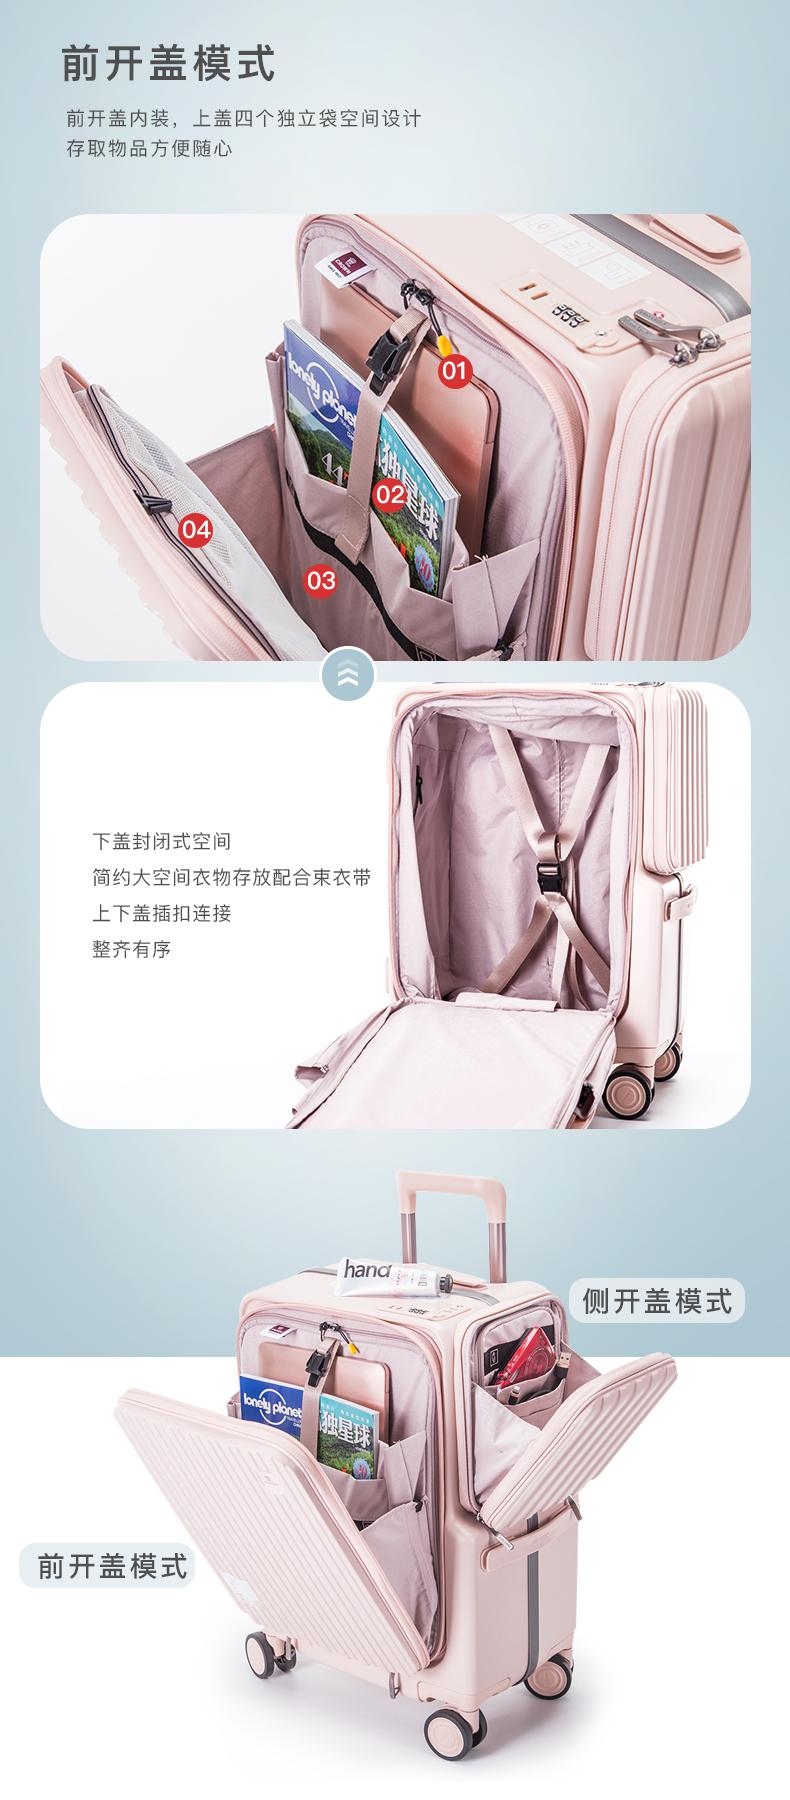 CROWN/皇冠拉链铝框箱拉杆箱商务行李箱